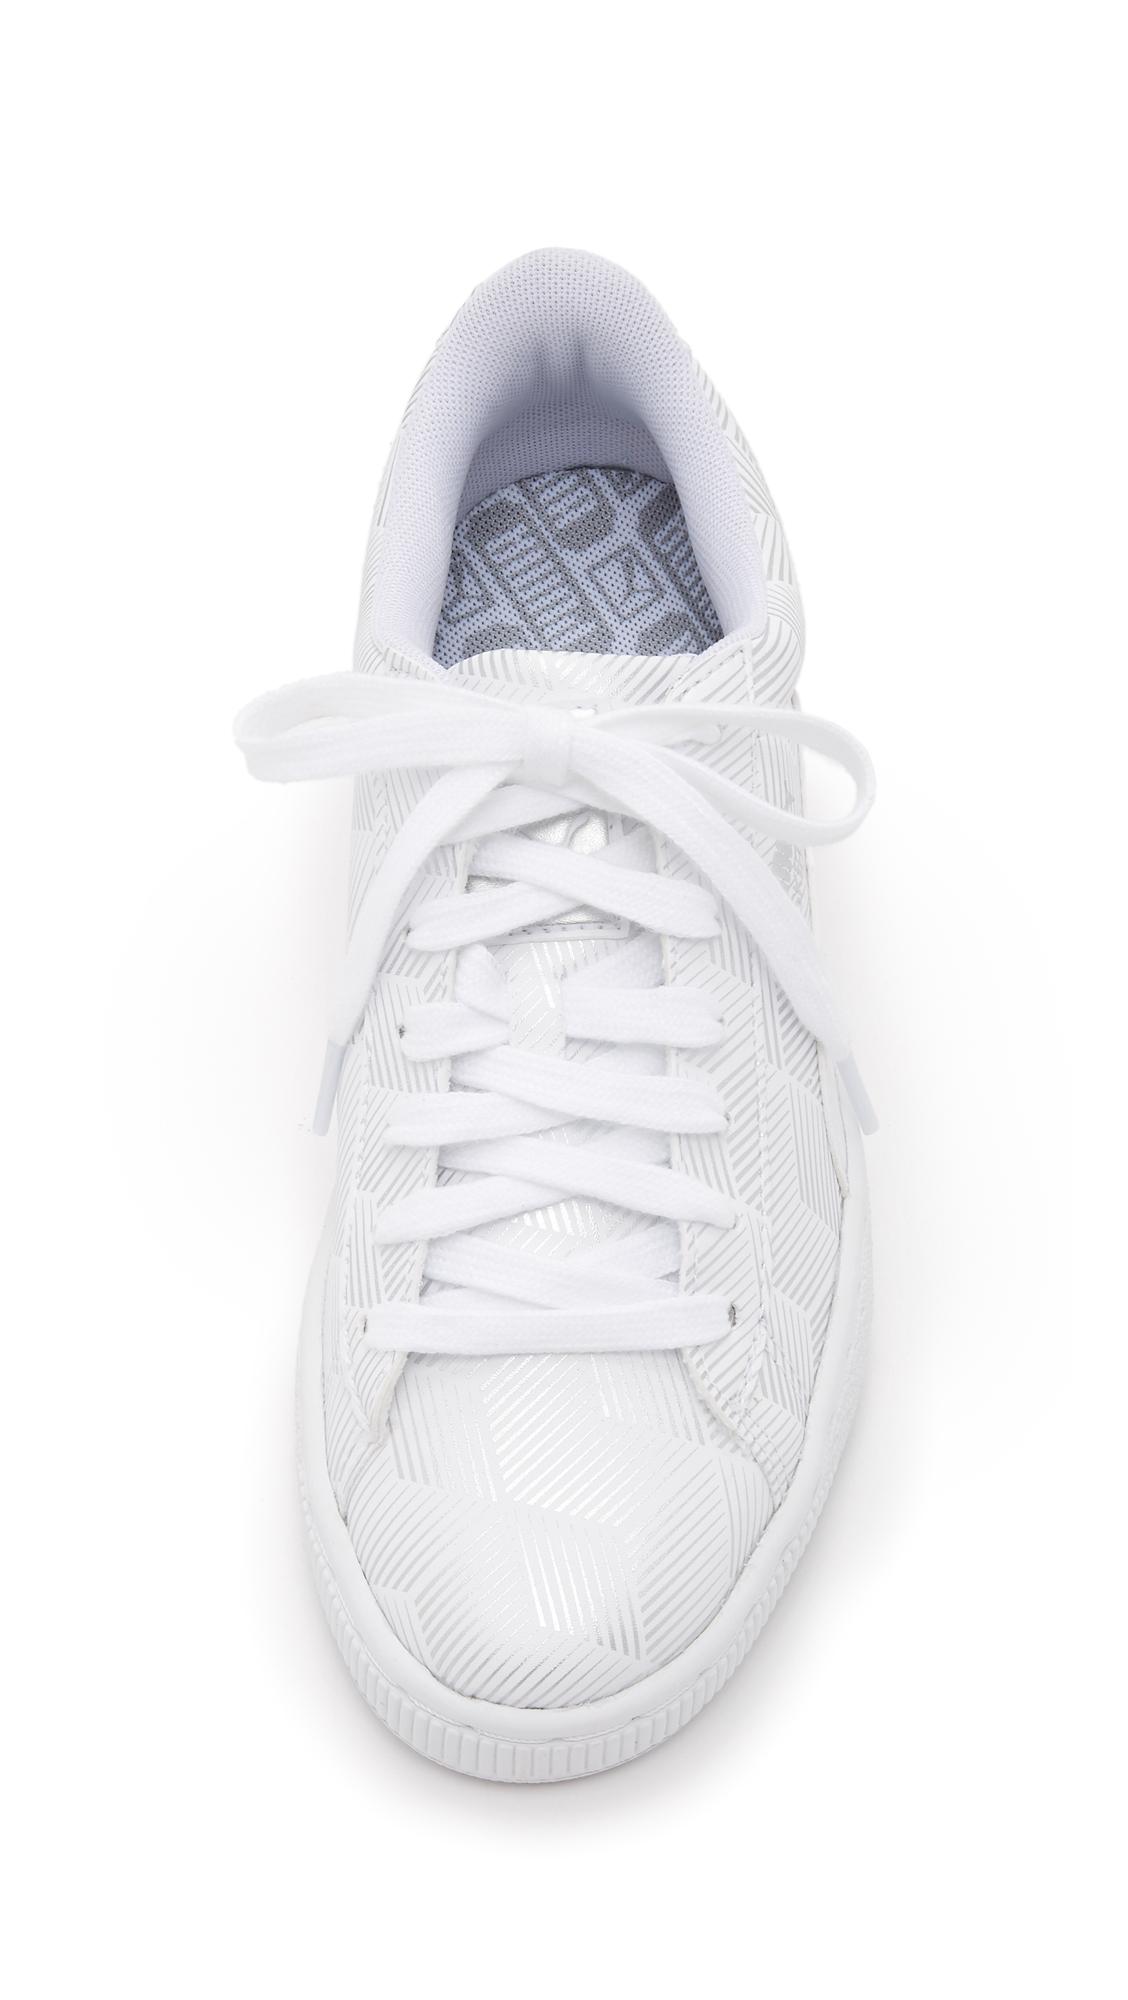 dae41bf87504 PUMA Basket Classic Metallic Sneakers